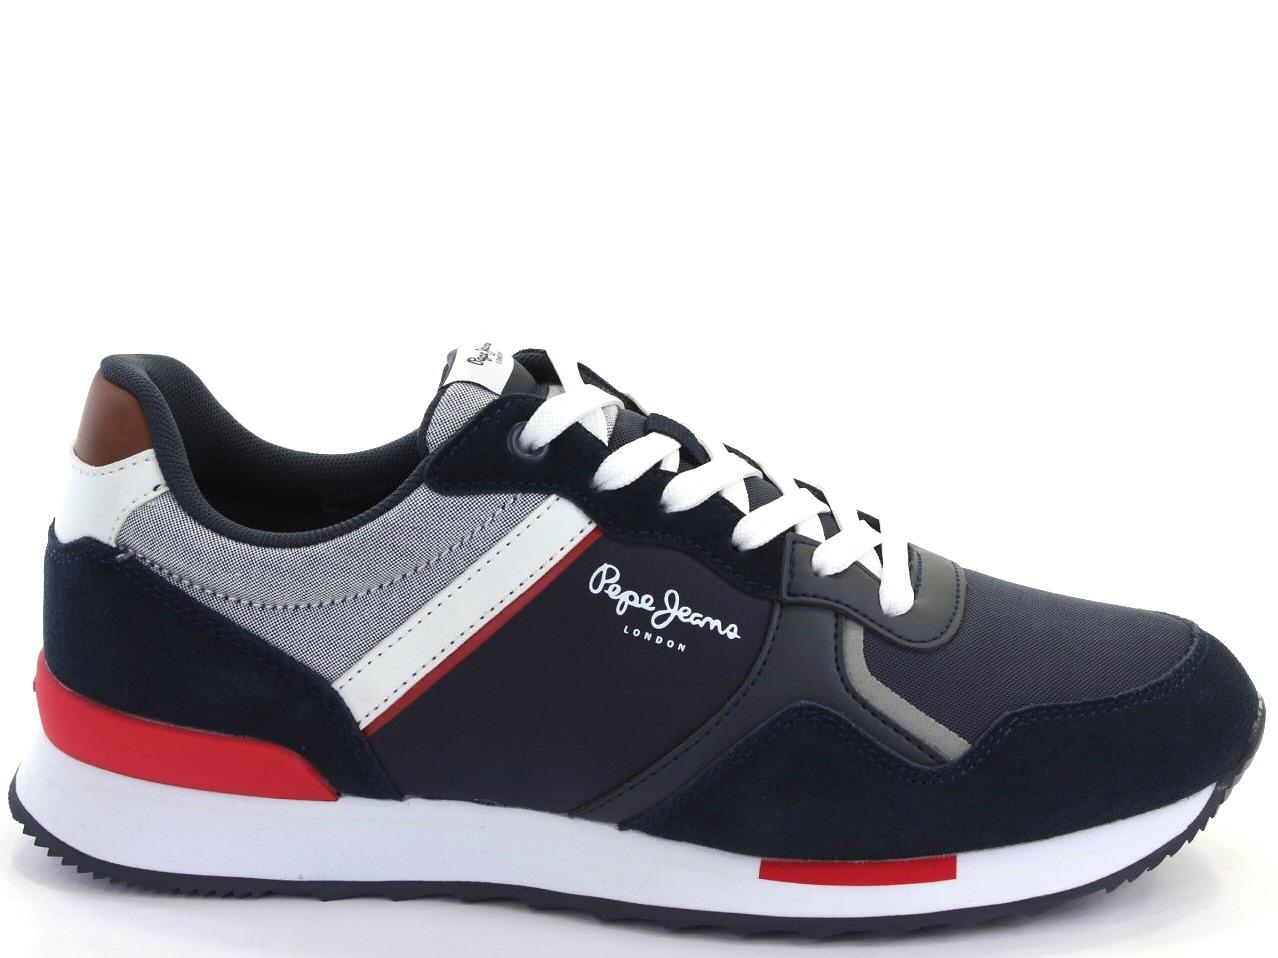 Sneakers, Espadrilles Pepe Jeans - 608 PMS30704